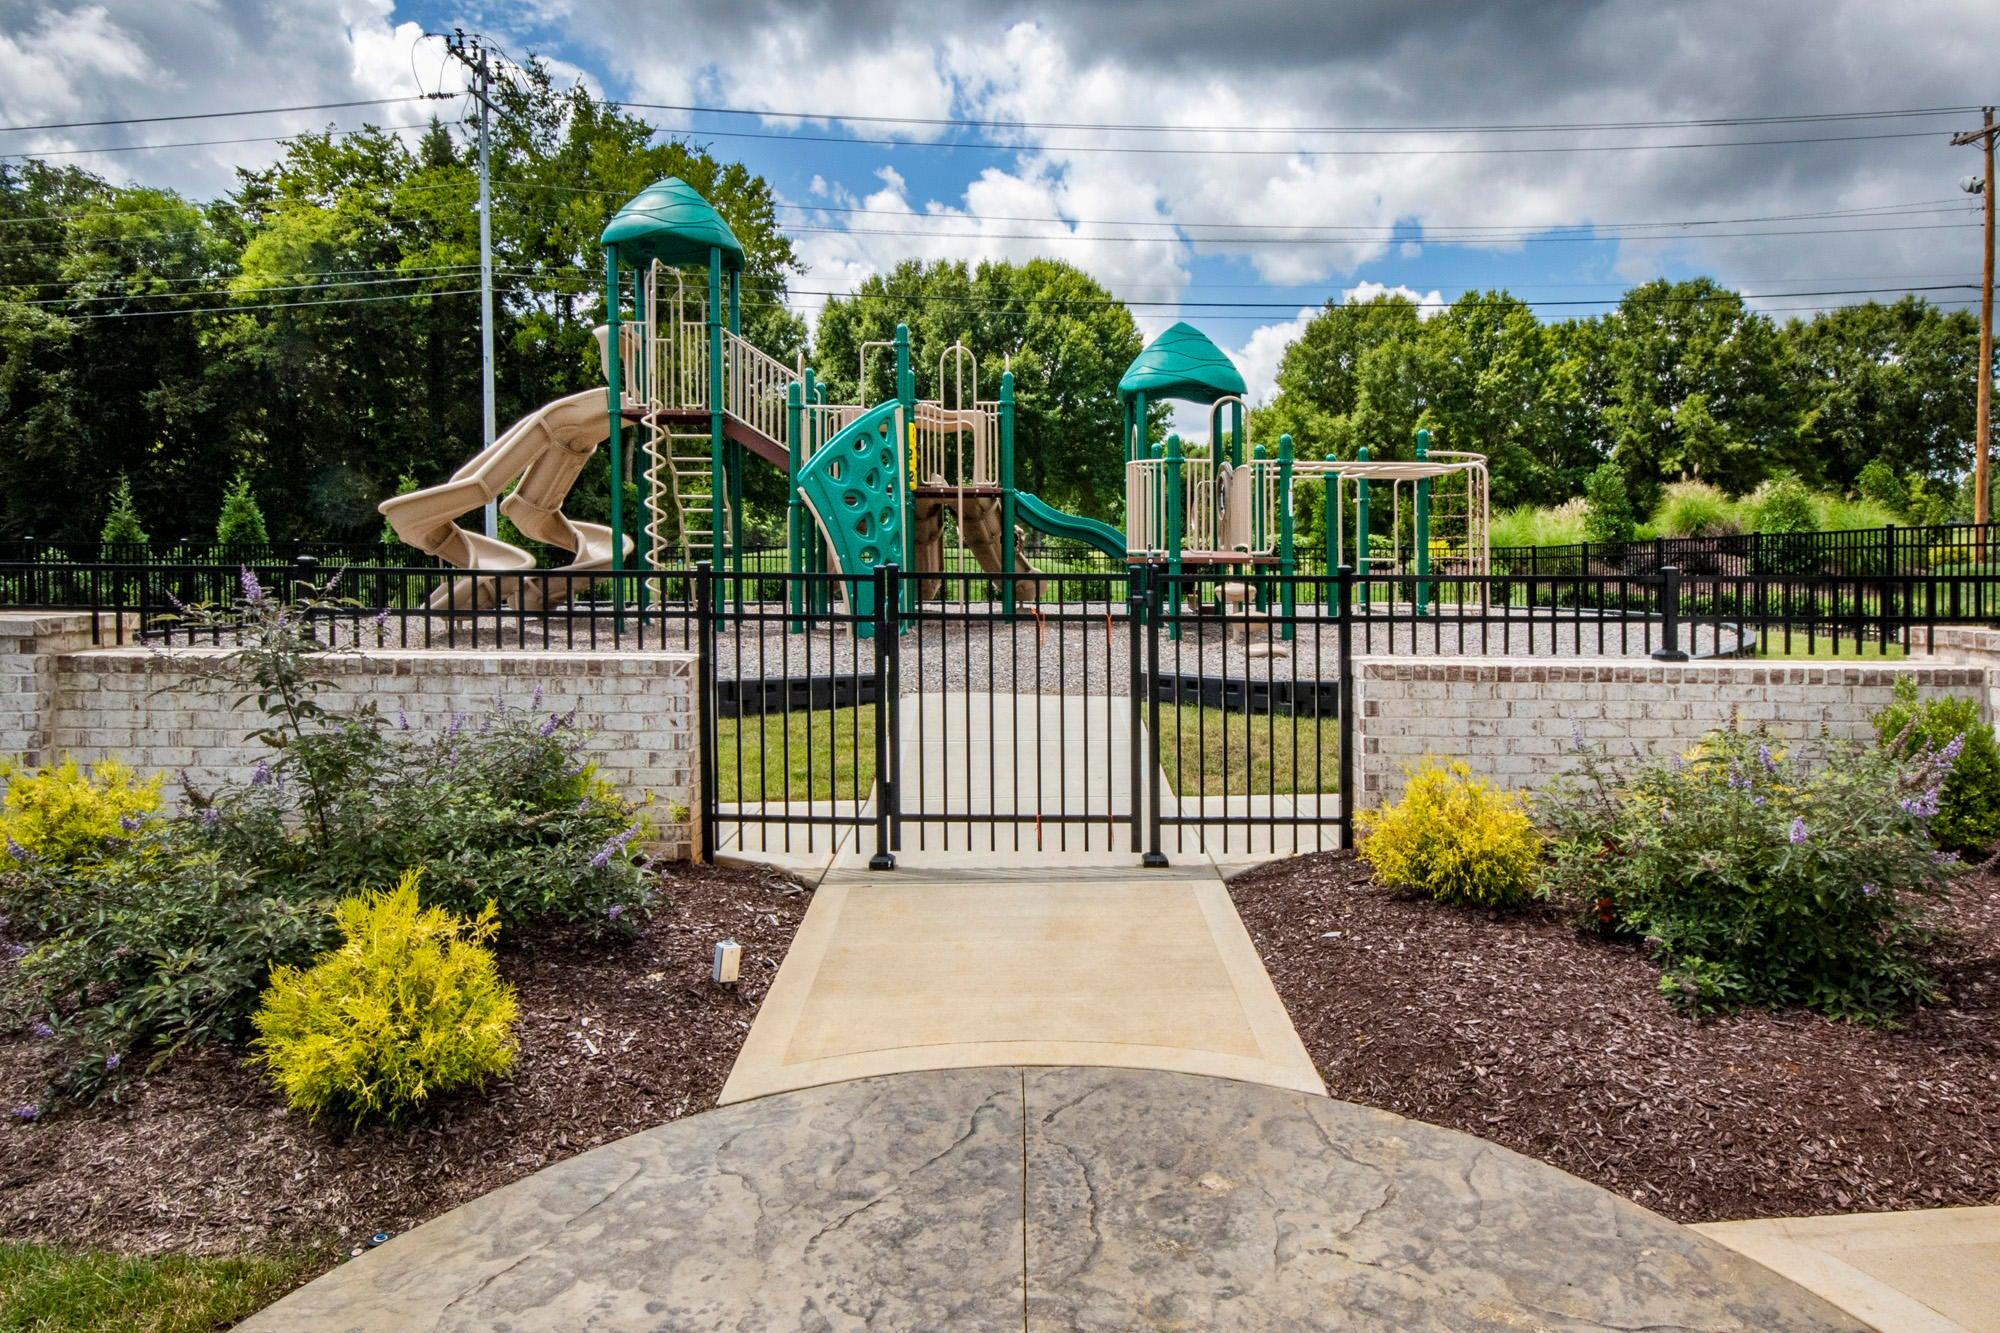 Brookmere community play area